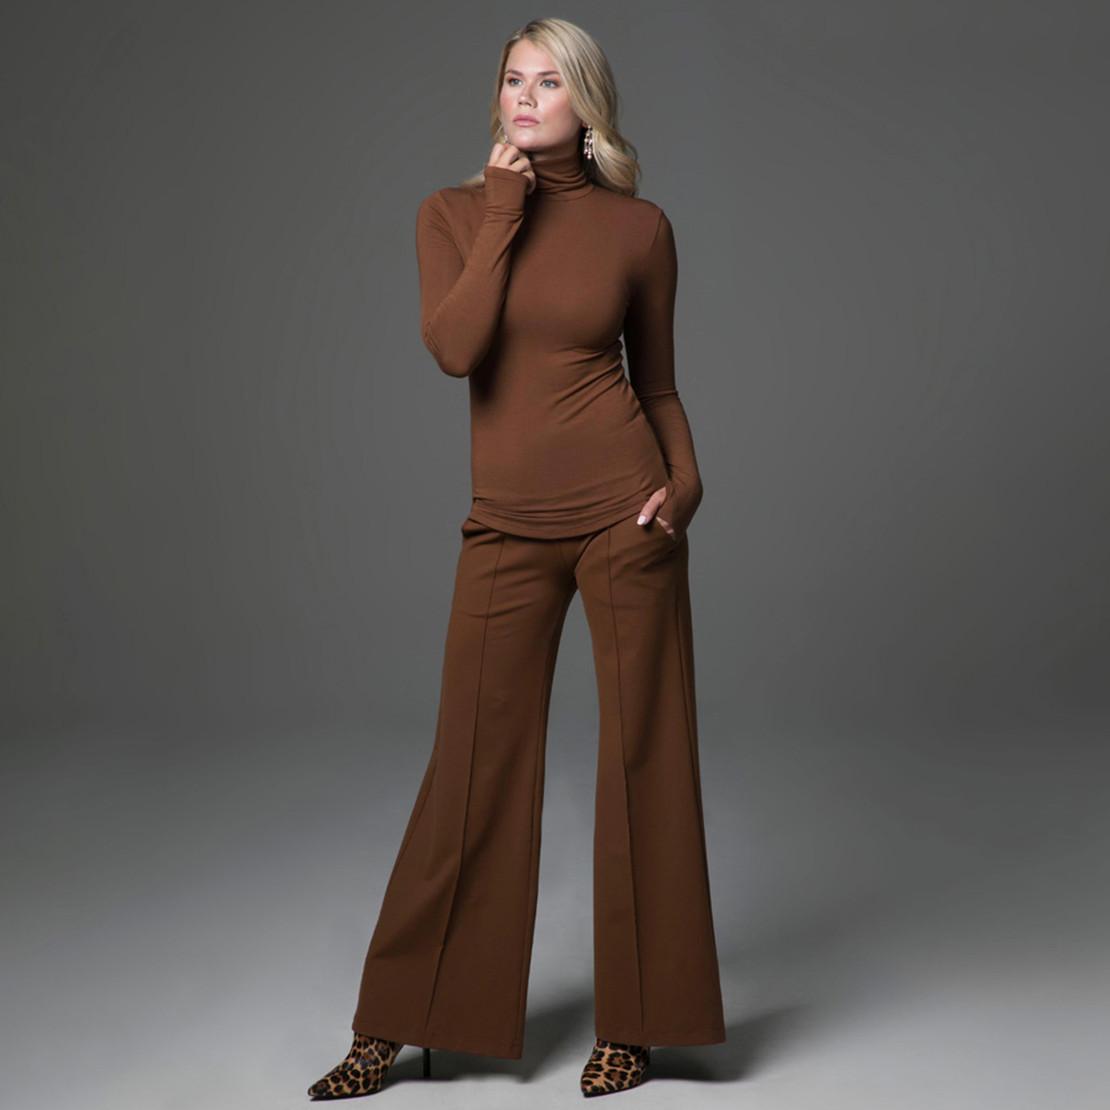 Transform Your Wardrobe with Yoga Dress Pants